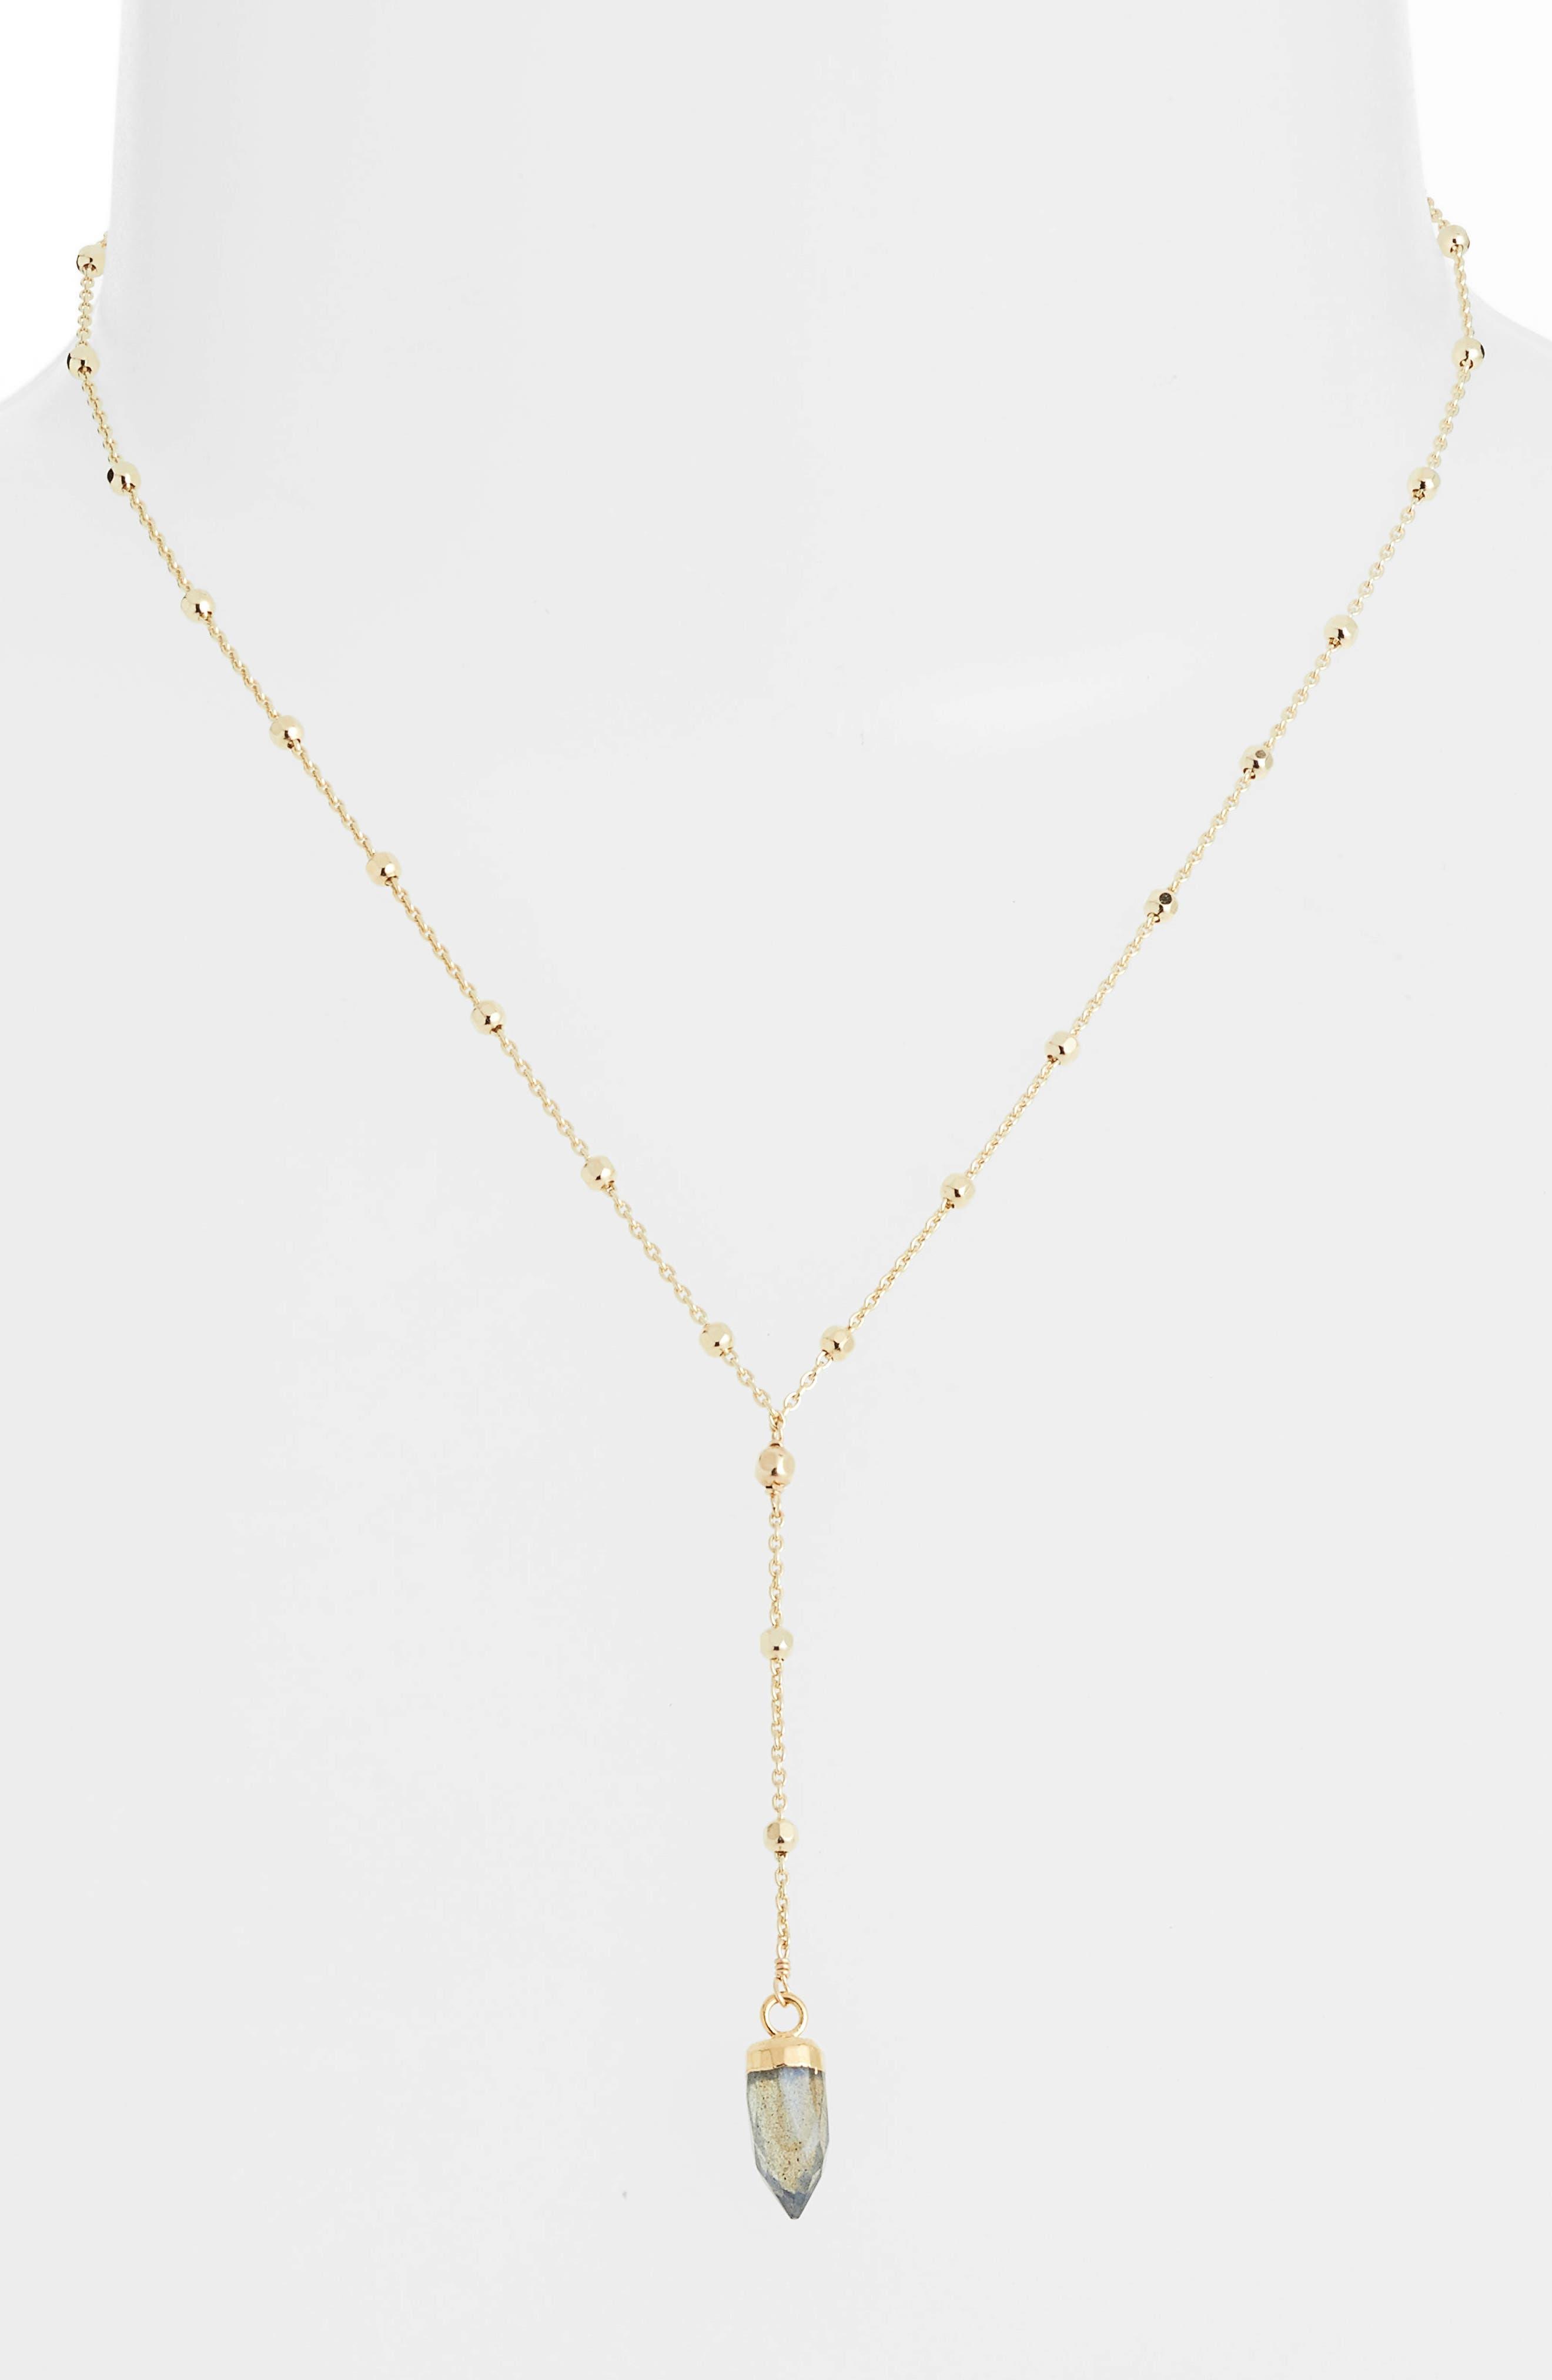 Patience Wisdom Labradorite Necklace,                             Alternate thumbnail 2, color,                             GOLD